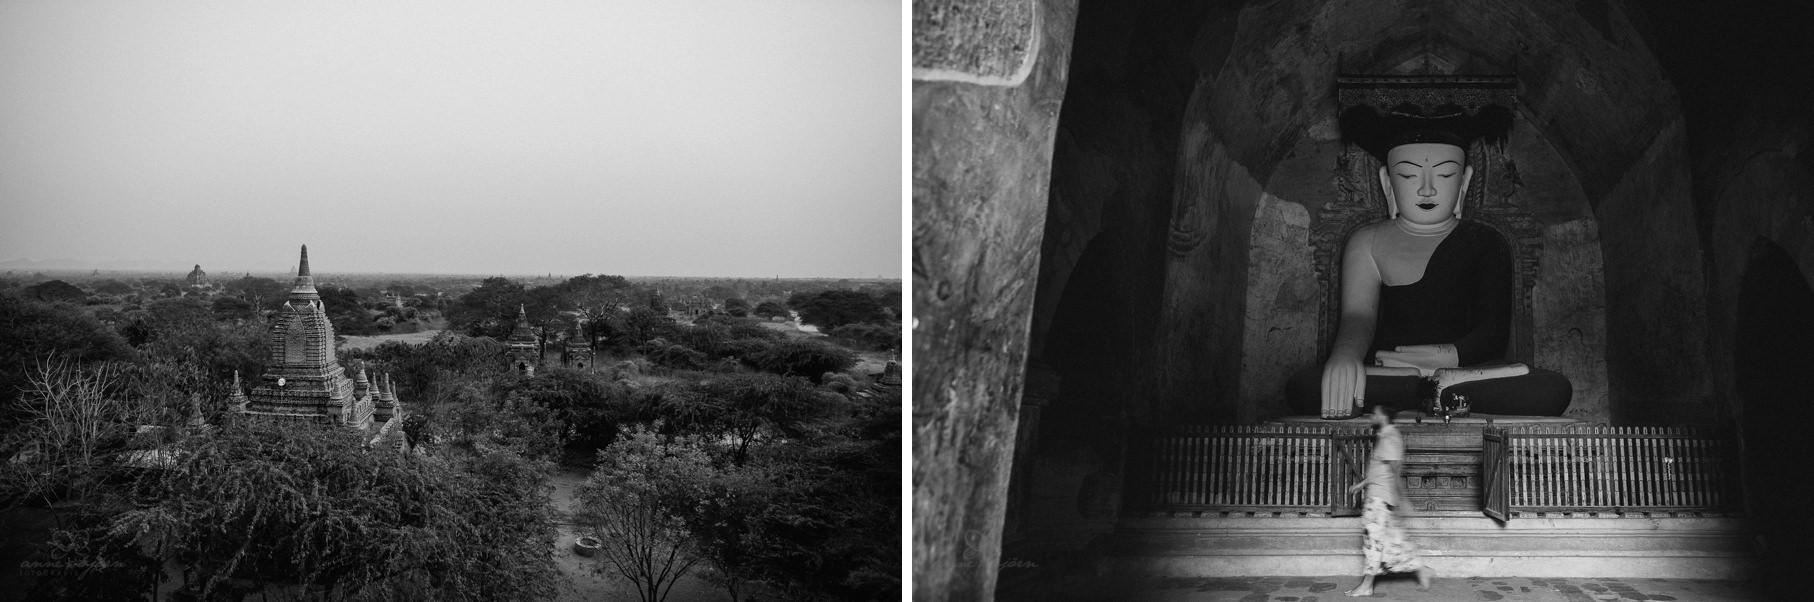 0017 bagan ngwesaung d76 7833 1 - Tempelstadt Bagan & tauchen am Ngwesaungbeach